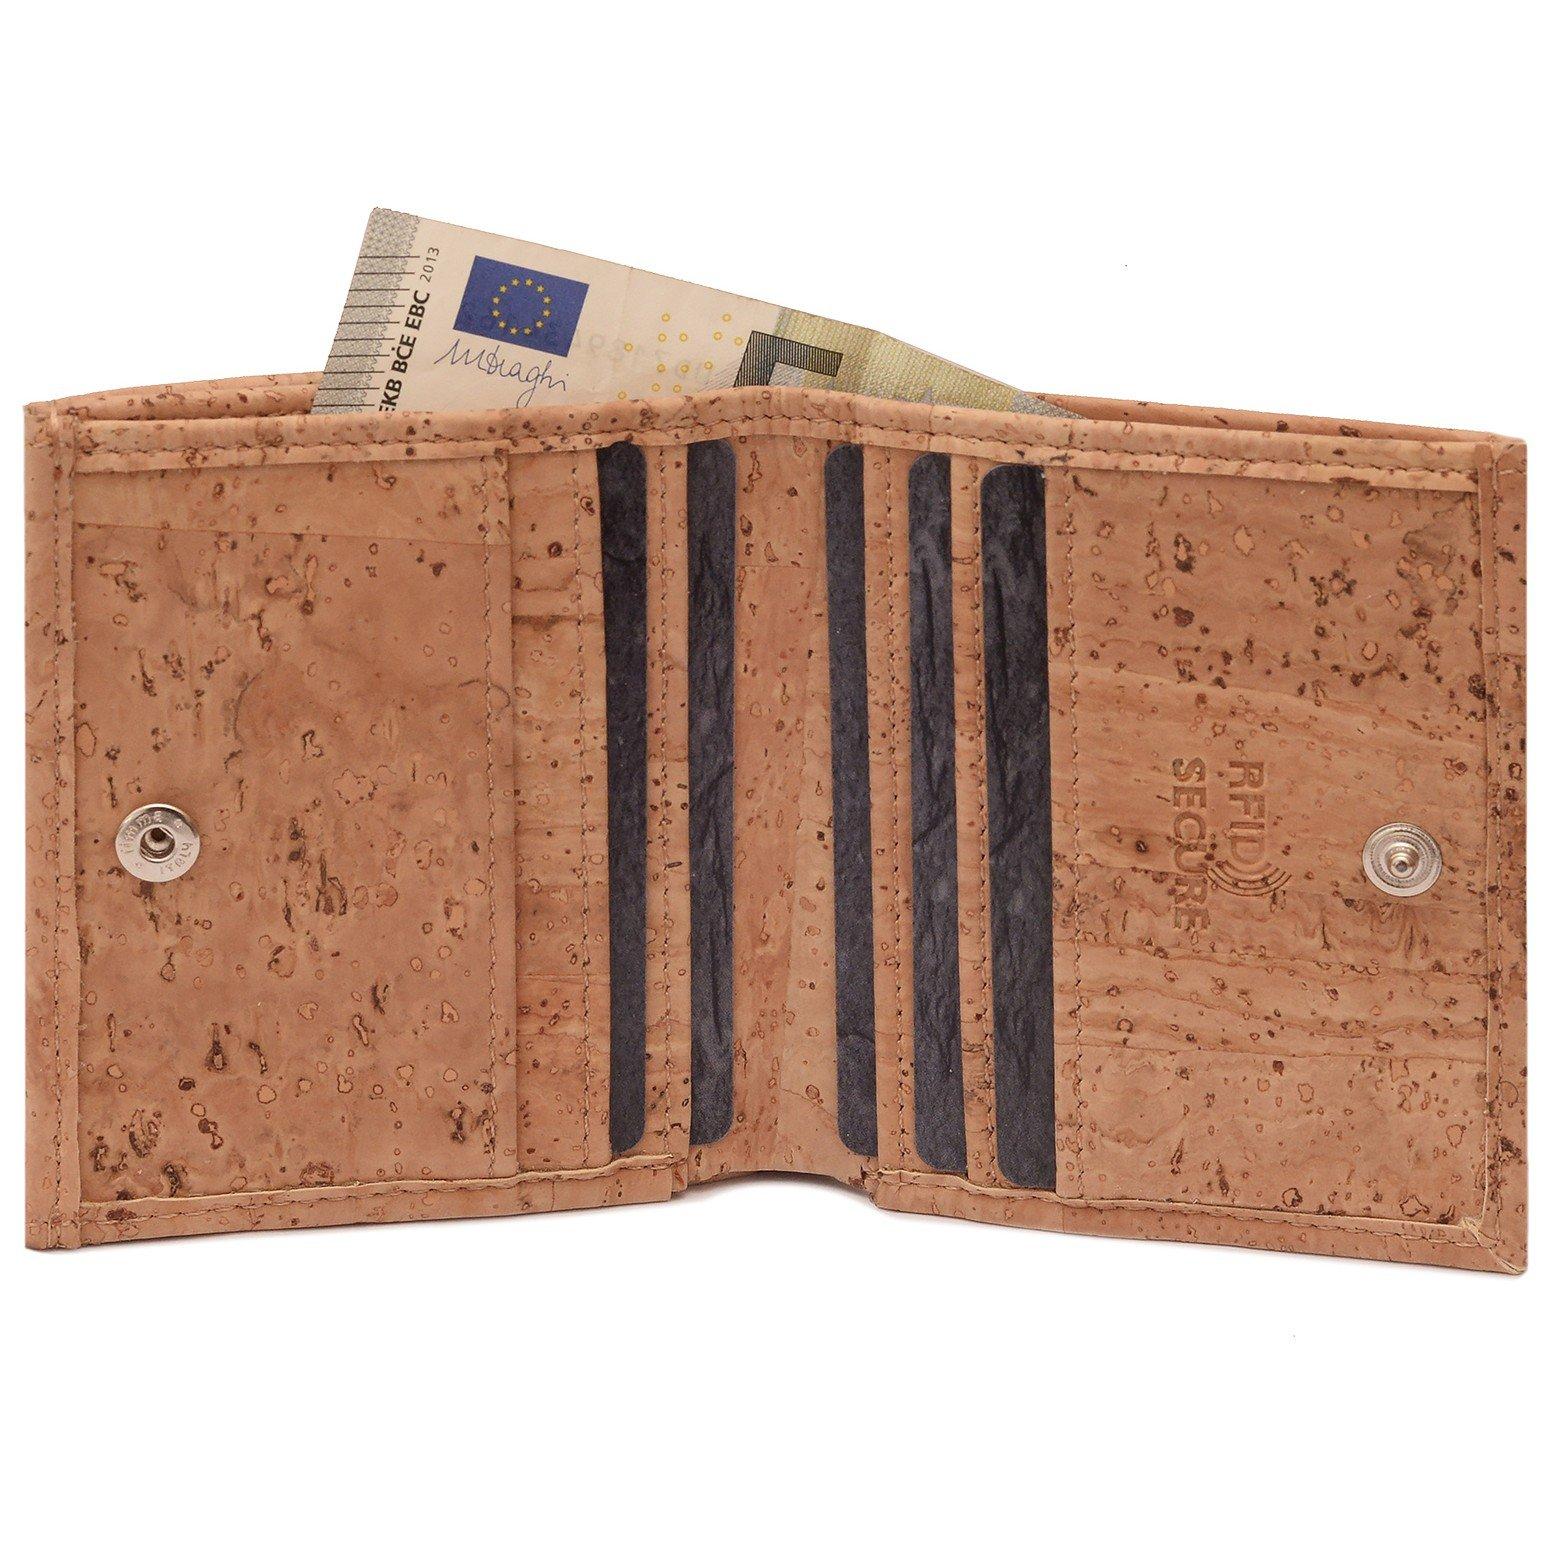 SIMARU-BARBAROSSA-RFID-BLOCK-Kork-Portemonnaie1